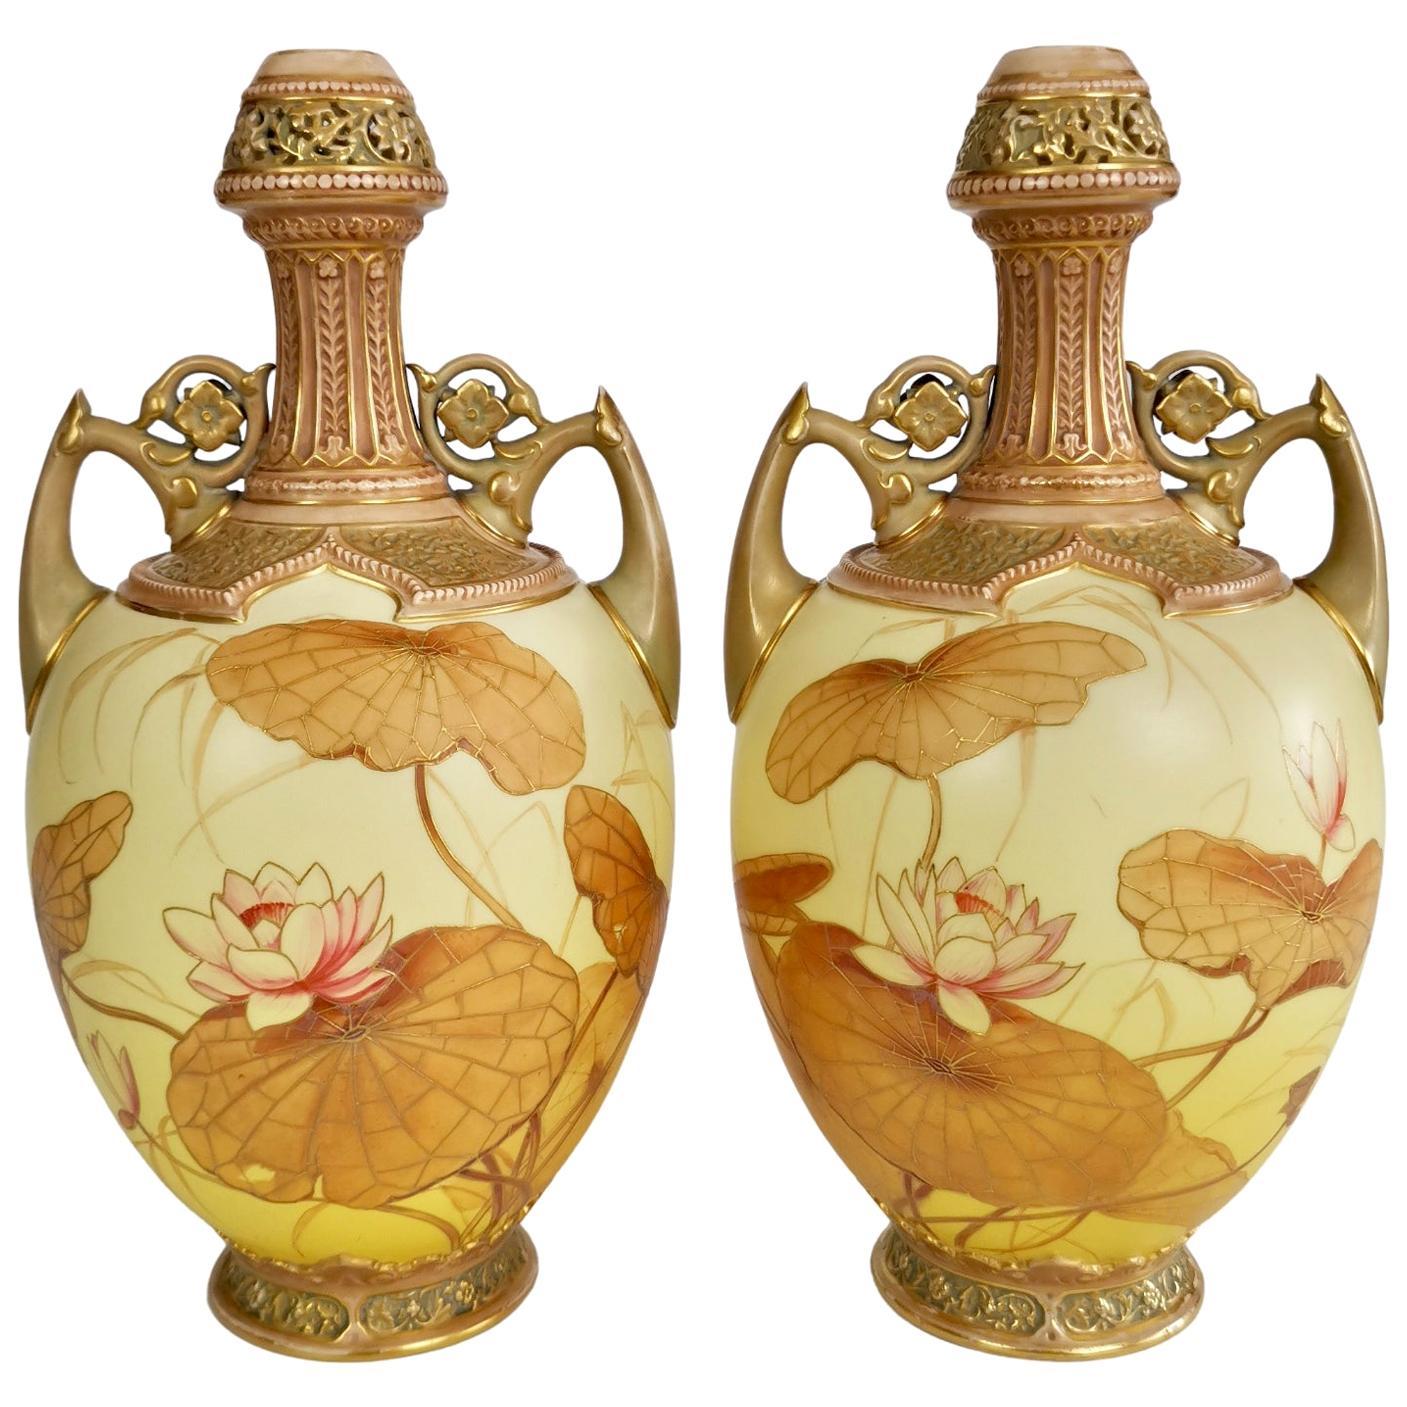 Royal Worcester Pair of Persian Porcelain Vases, Blush Ivory Japanese Lotus 1890